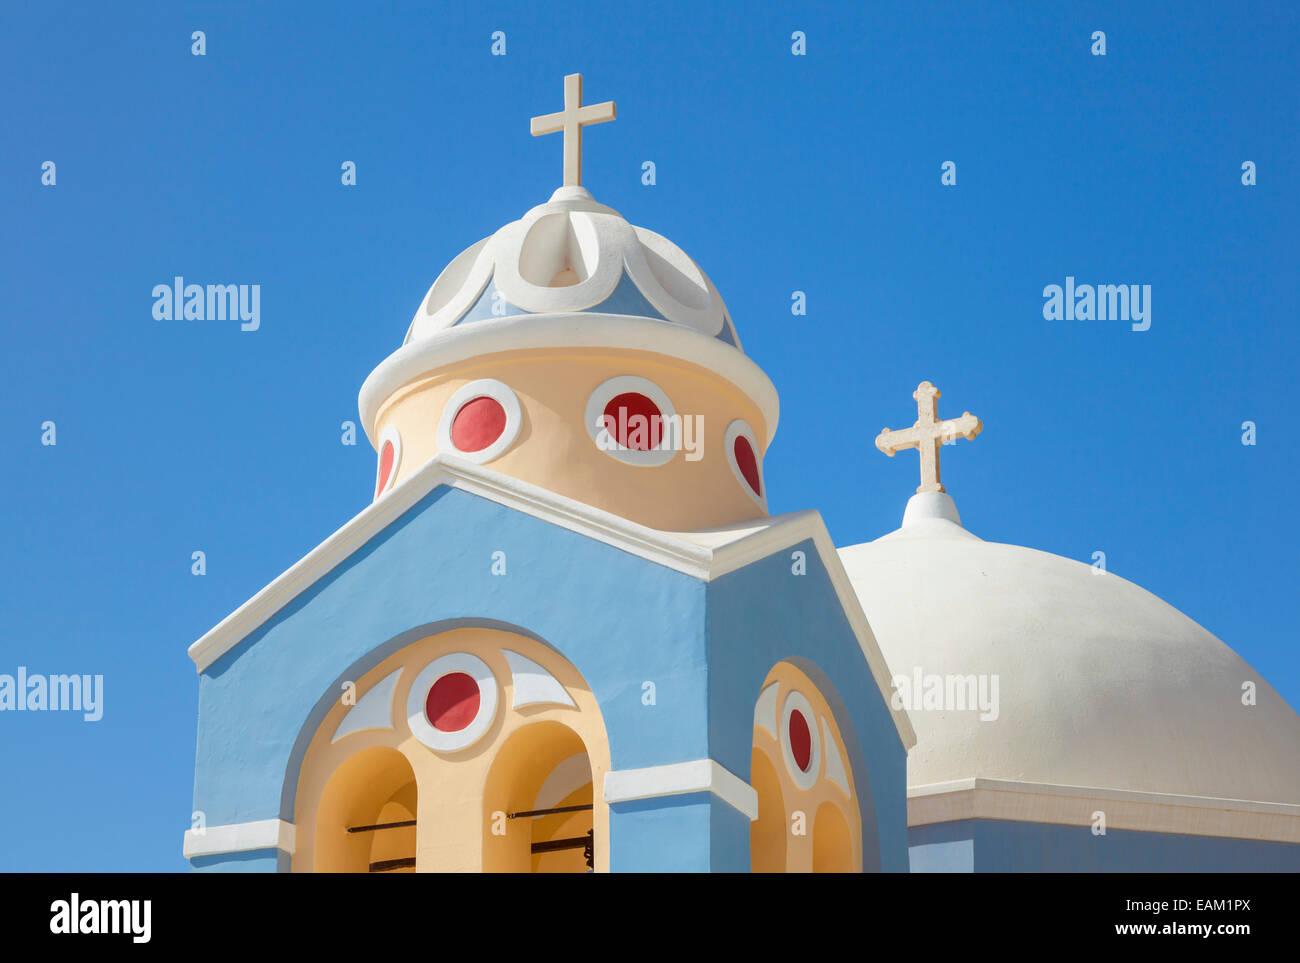 Iglesia Católica de San Stylianos, Fira, Santorini, Thira, islas Cícladas, del mar Egeo, en Grecia, la Imagen De Stock